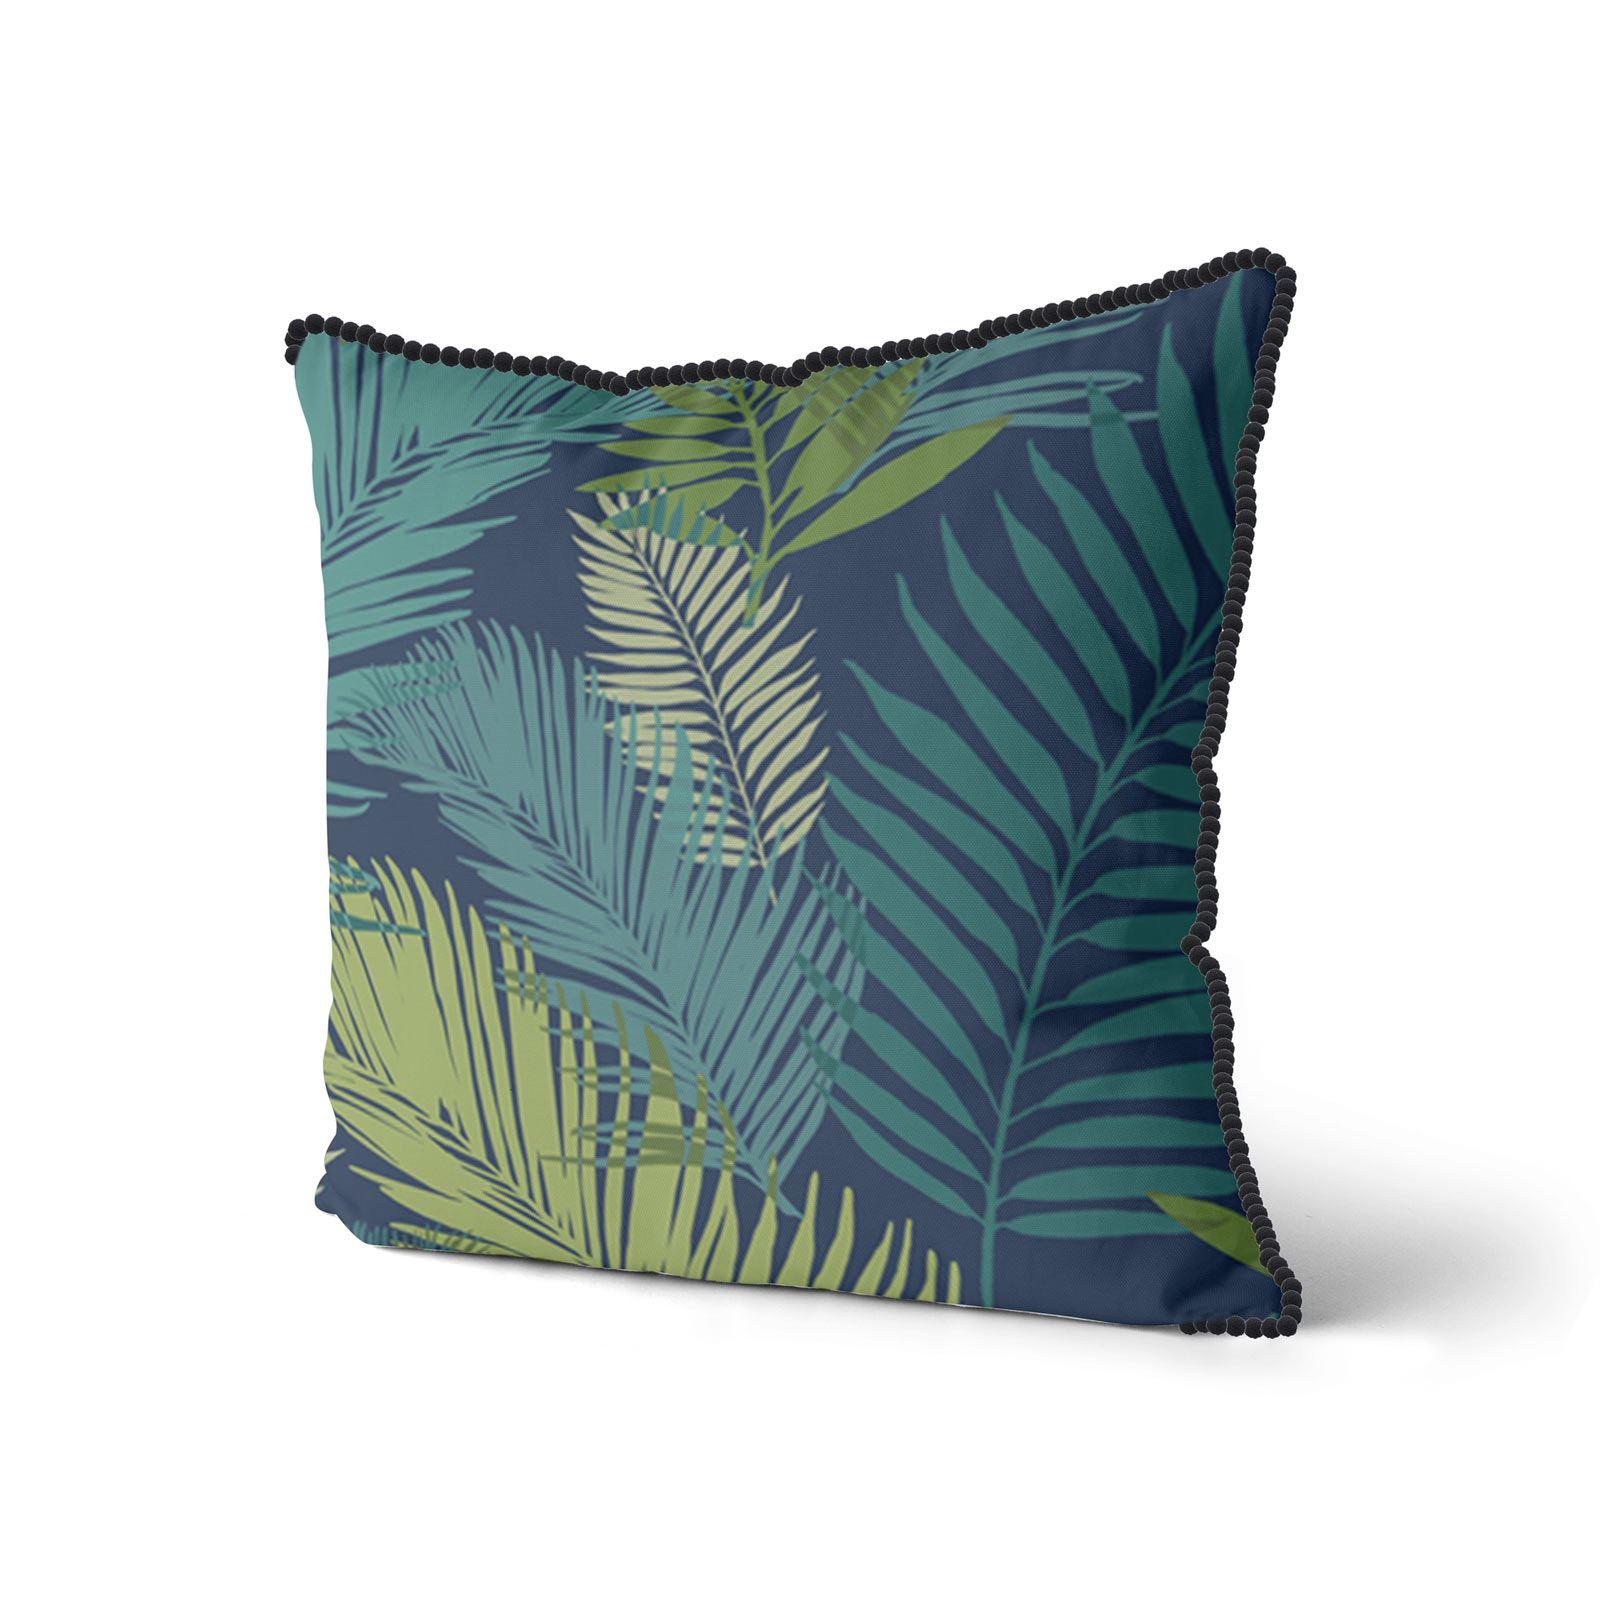 Teal-Blue-Duck-Egg-Cushion-Covers-18-034-x18-034-45cm-x-45cm-Luxury-Cover thumbnail 5